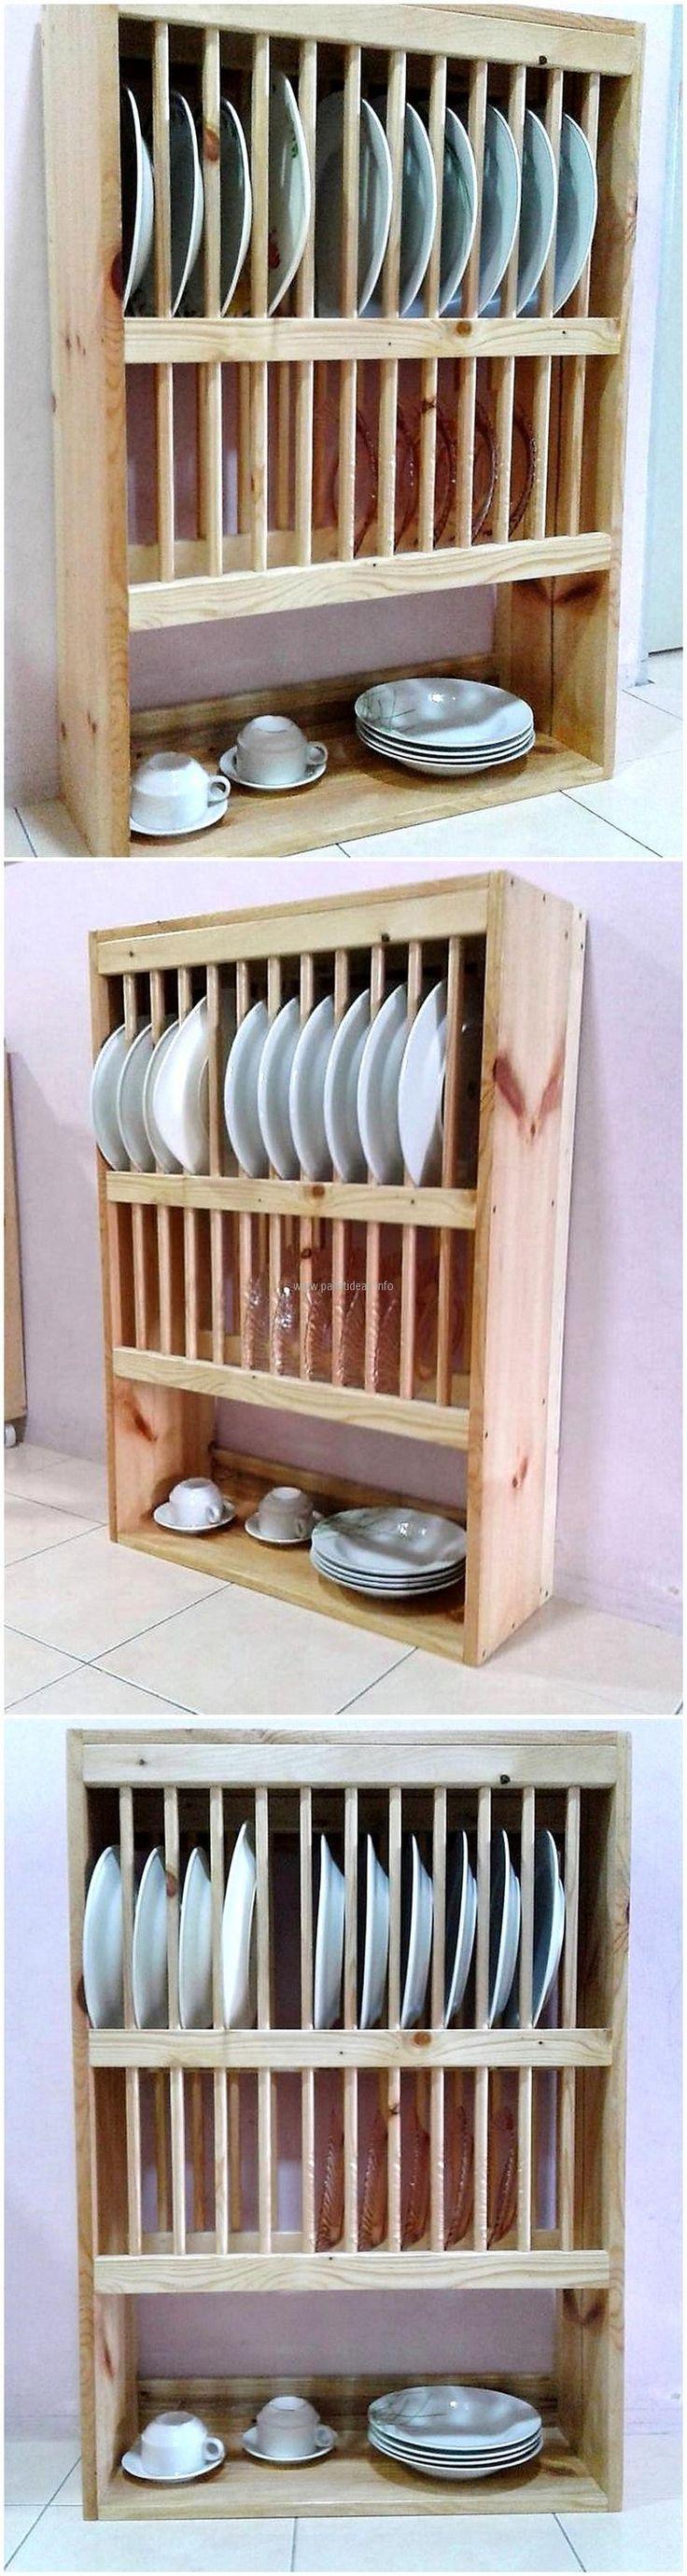 wood pallet kitchen plates shelves